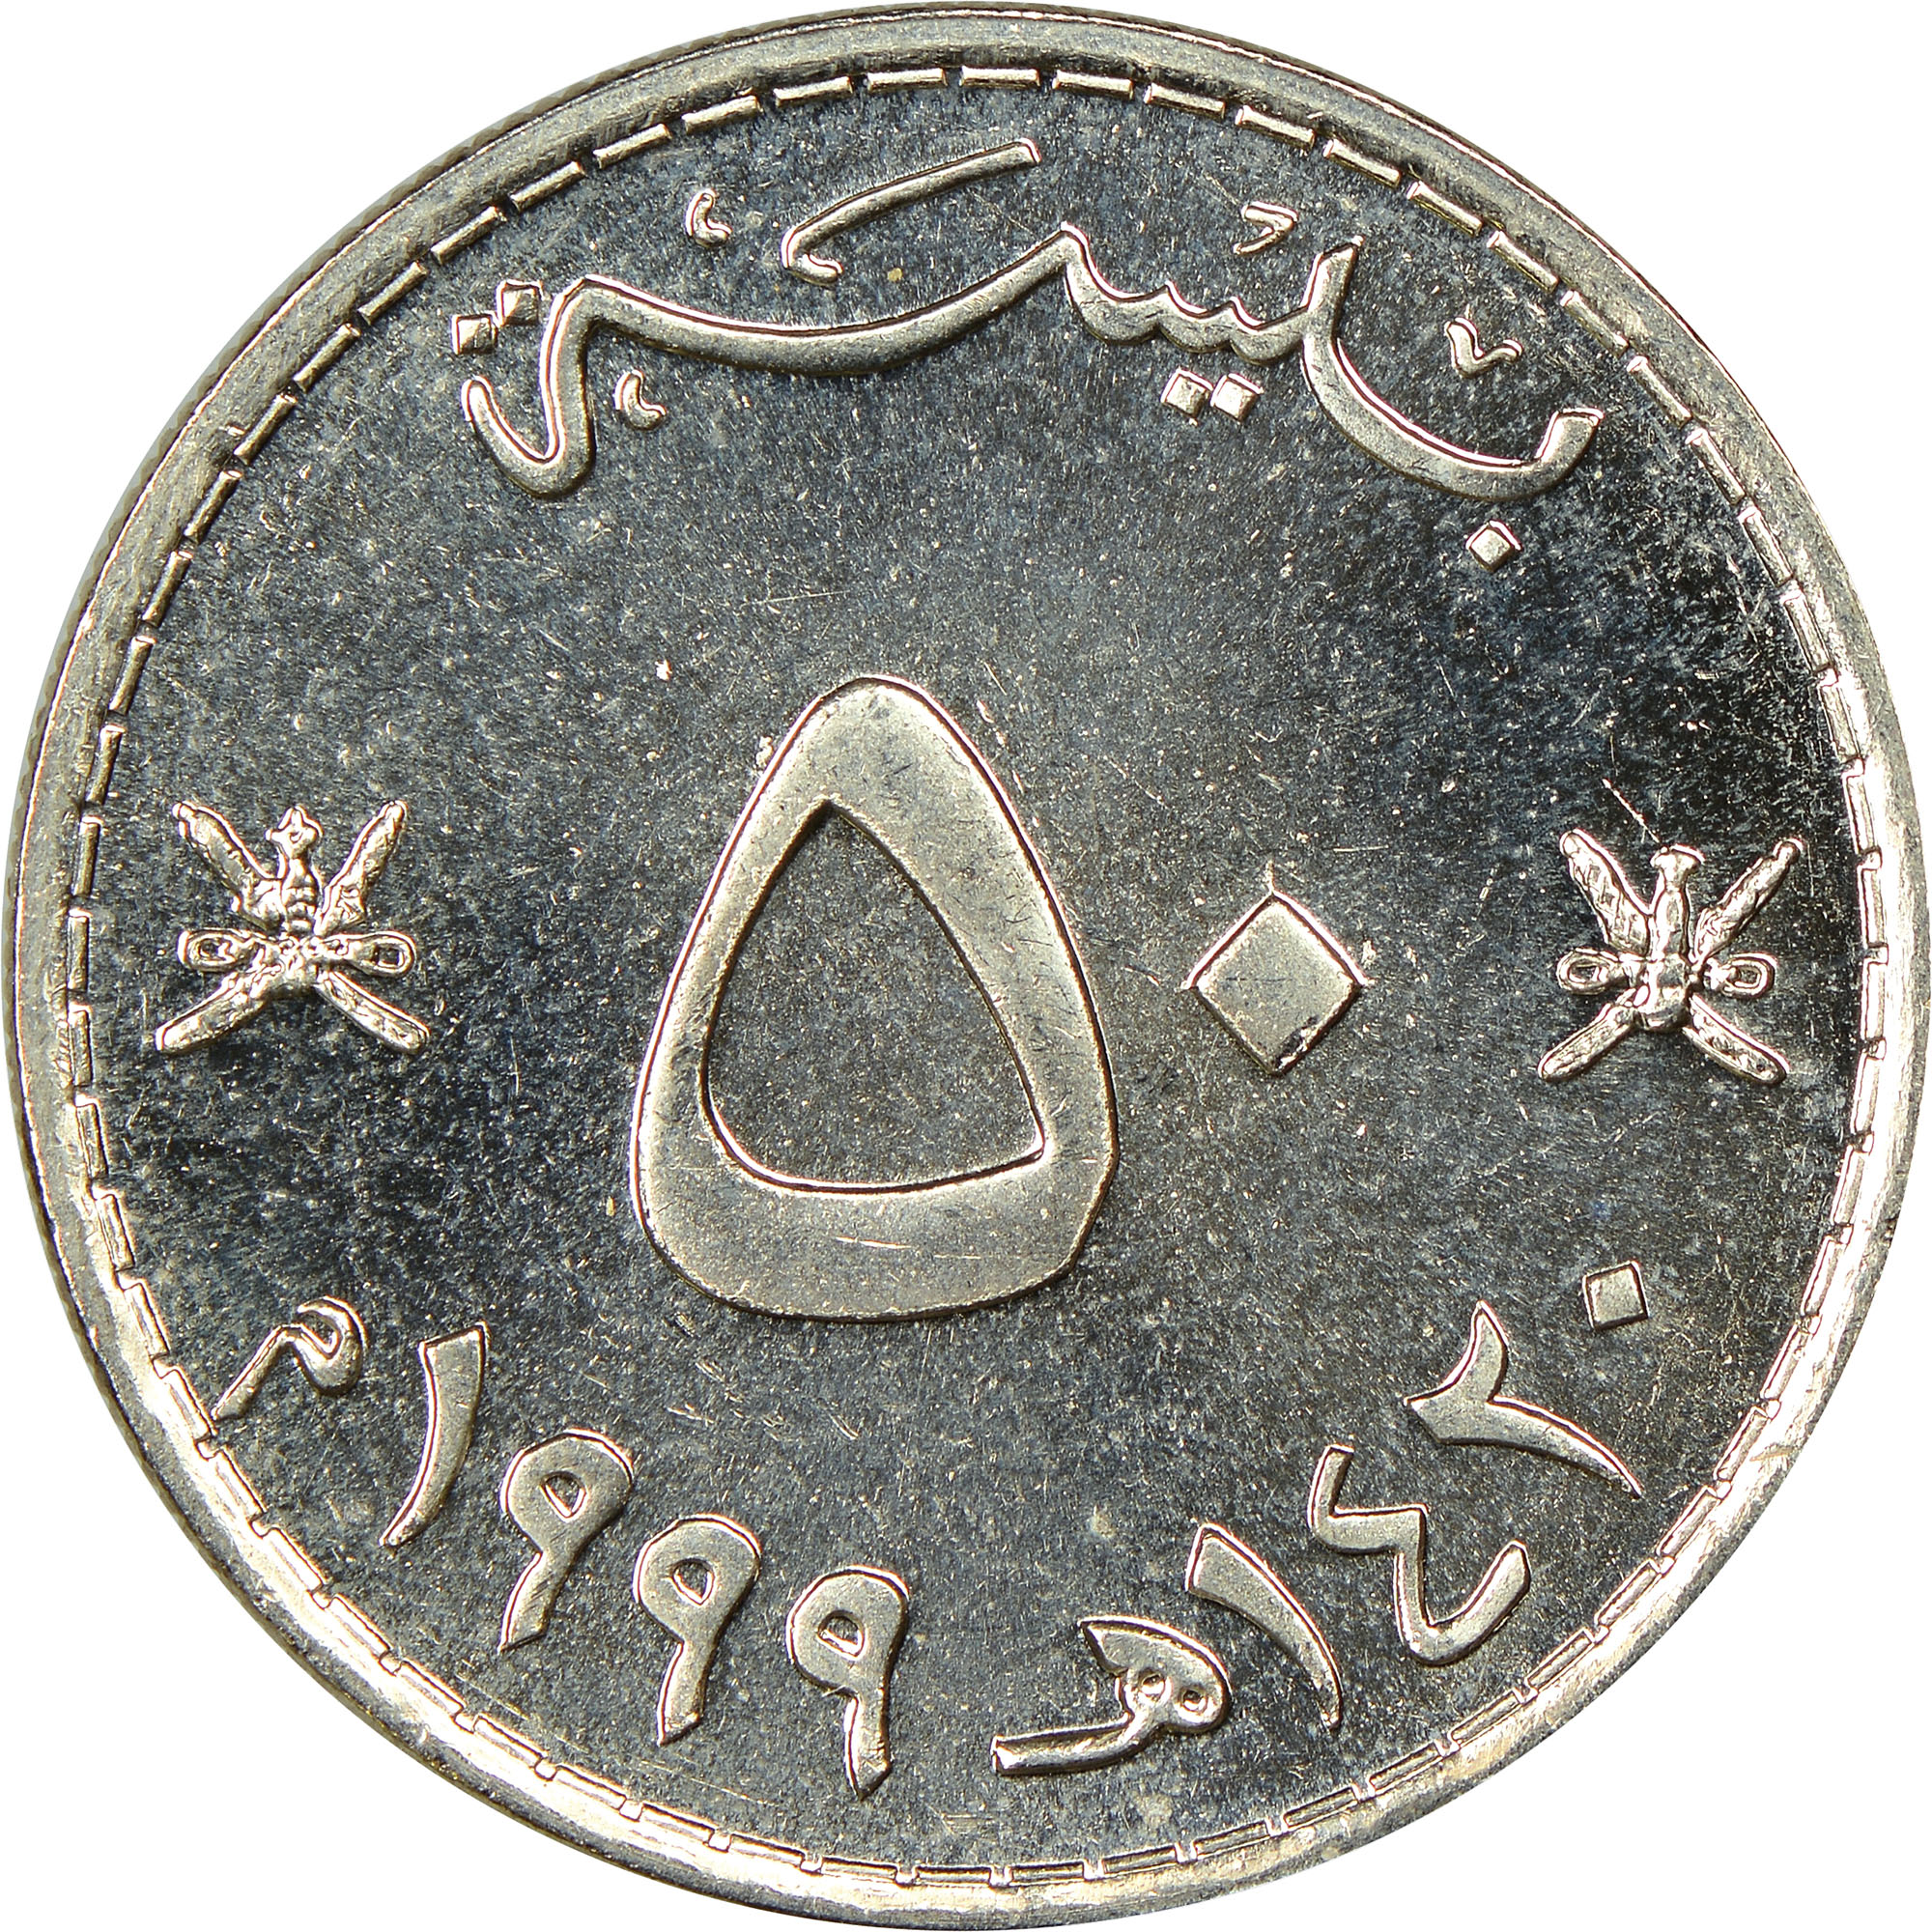 Oman 50 Baisa reverse